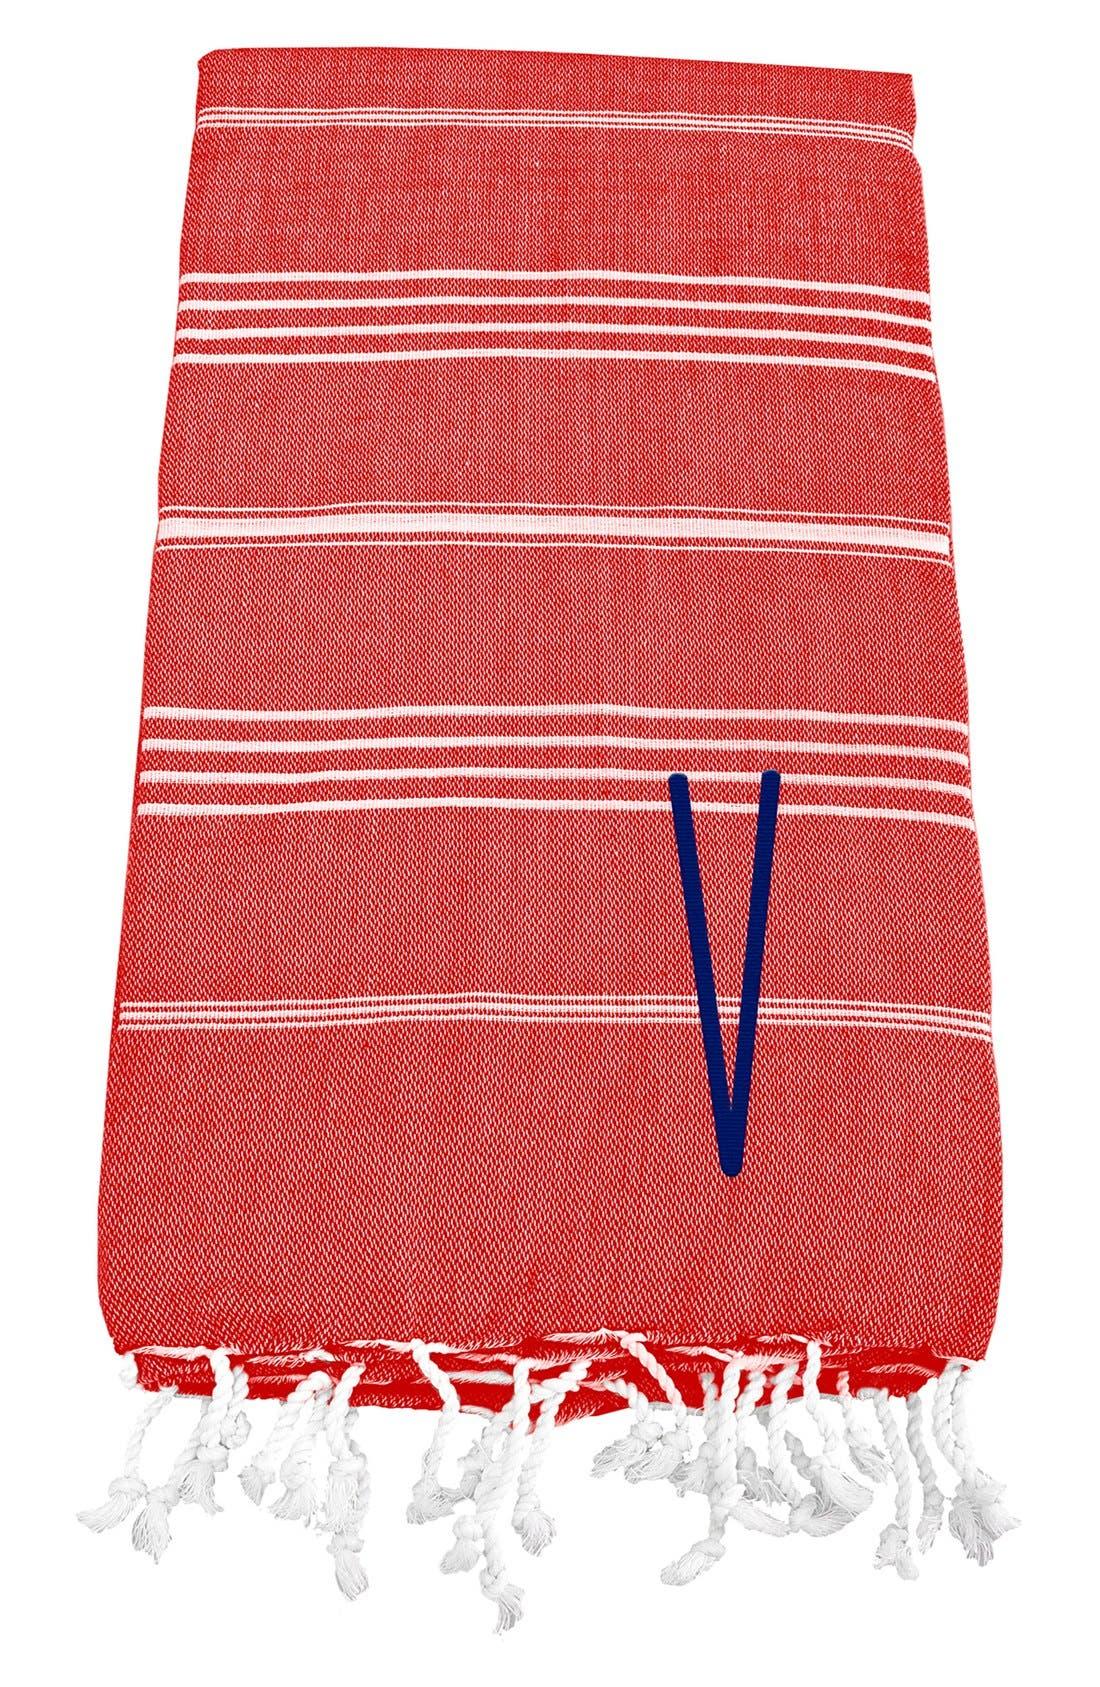 Monogram Turkish Cotton Towel,                             Main thumbnail 131, color,